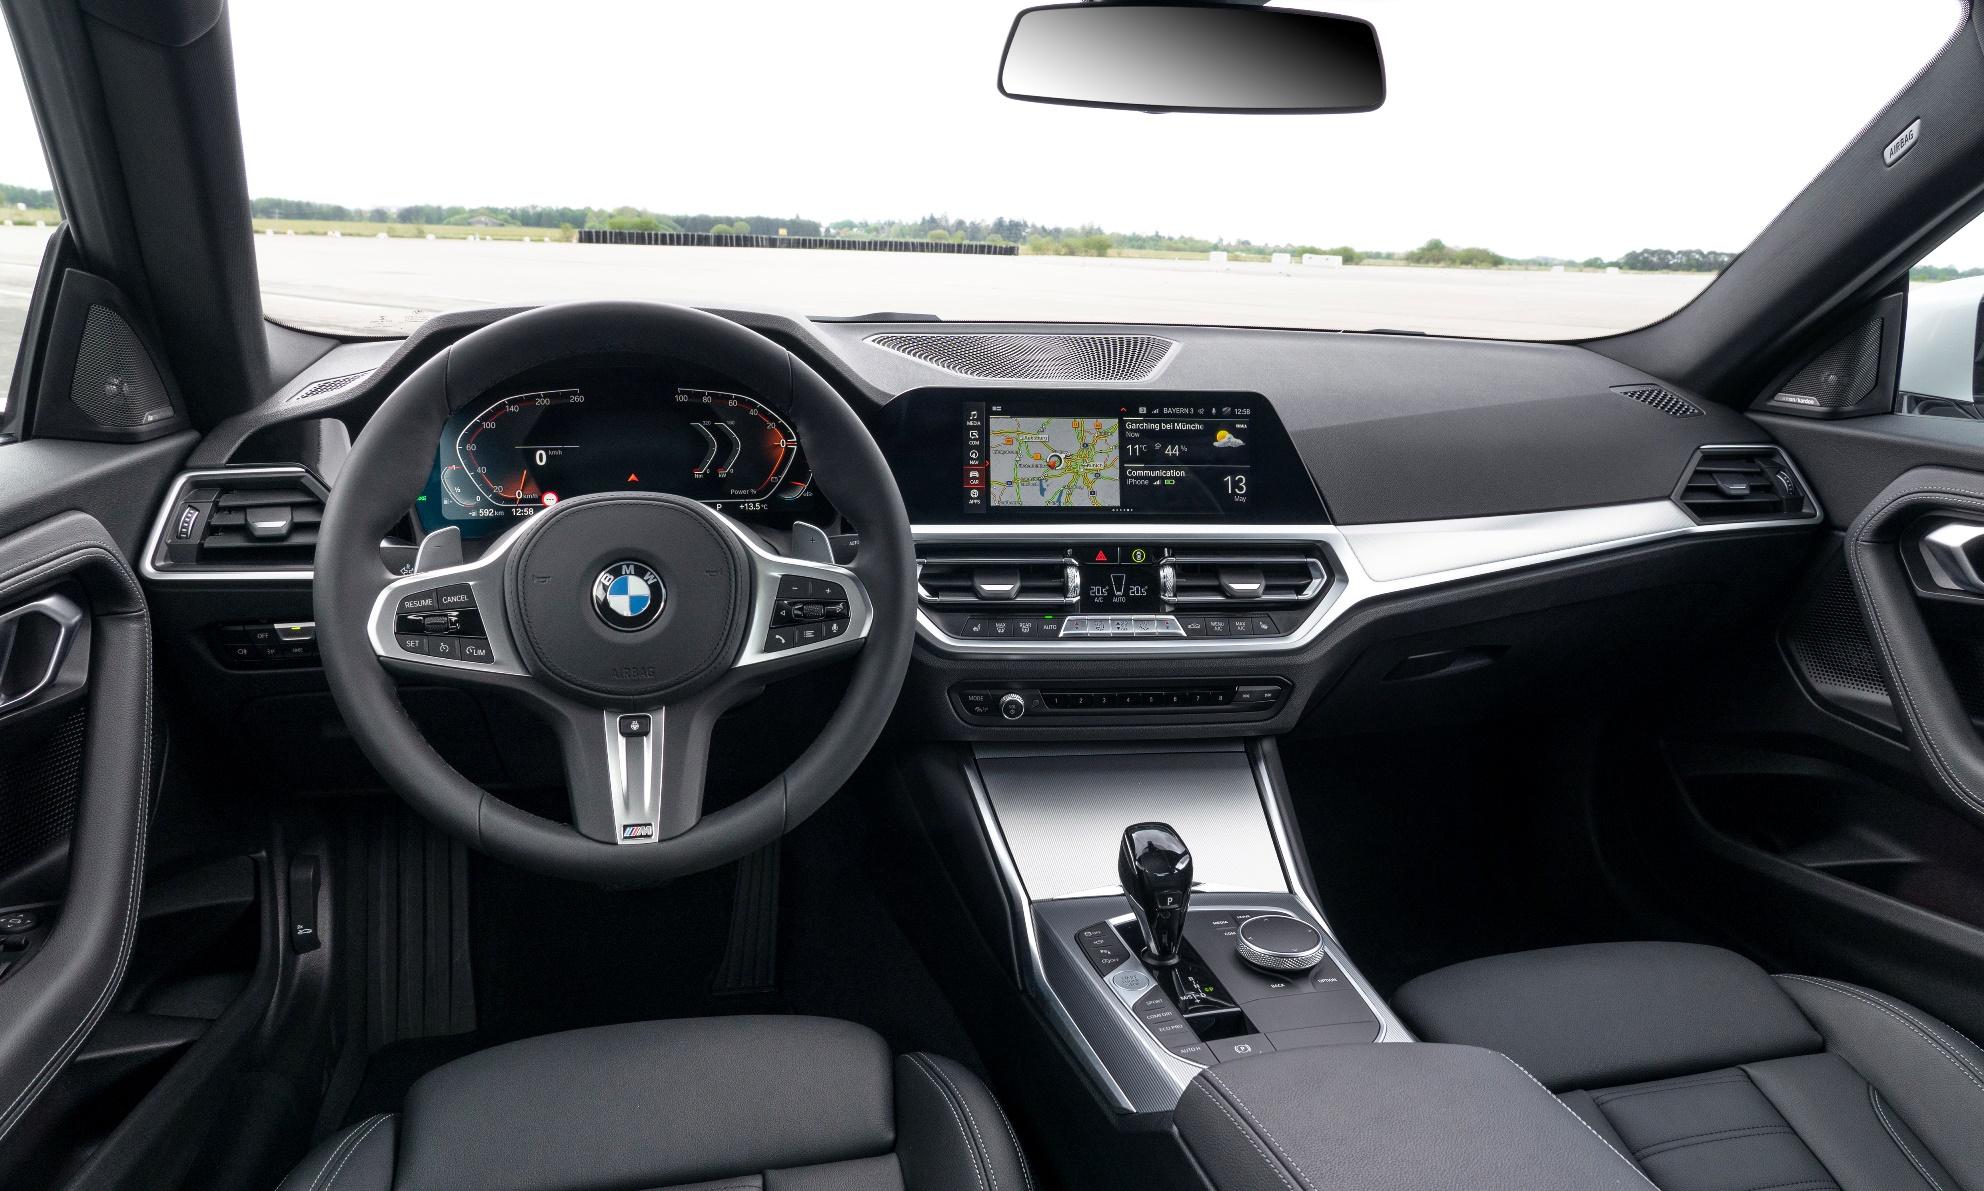 BMW 2 Series Coupe interio